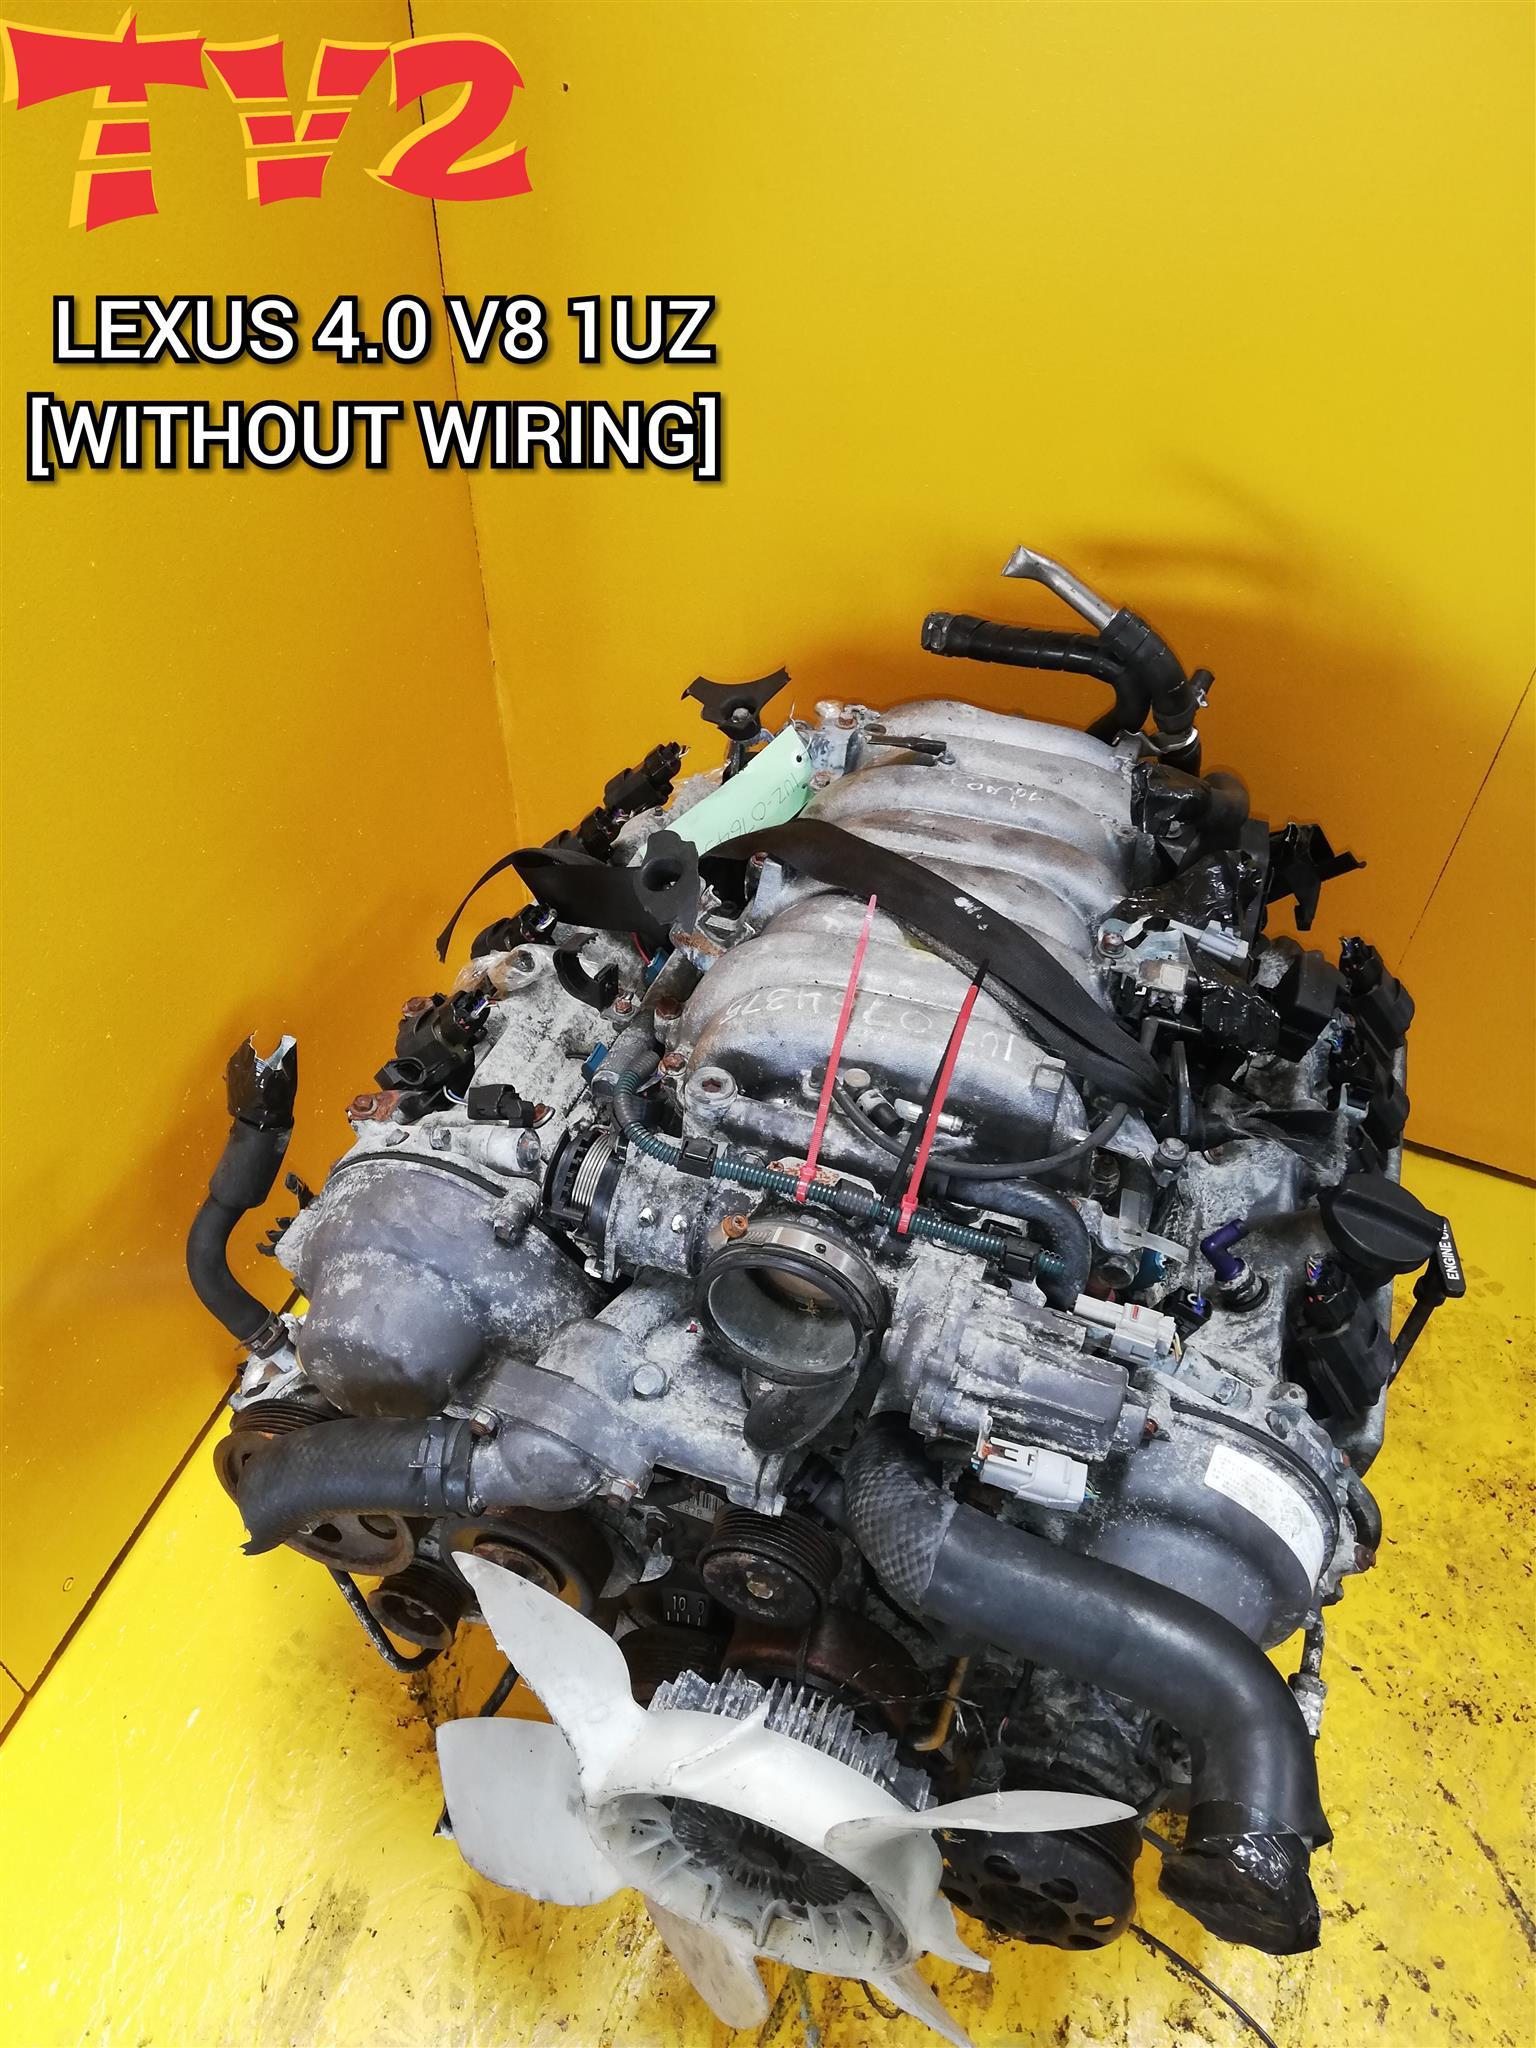 LEXUS 4.0 V8 1UZ VVTI ENGINE FOR SALE